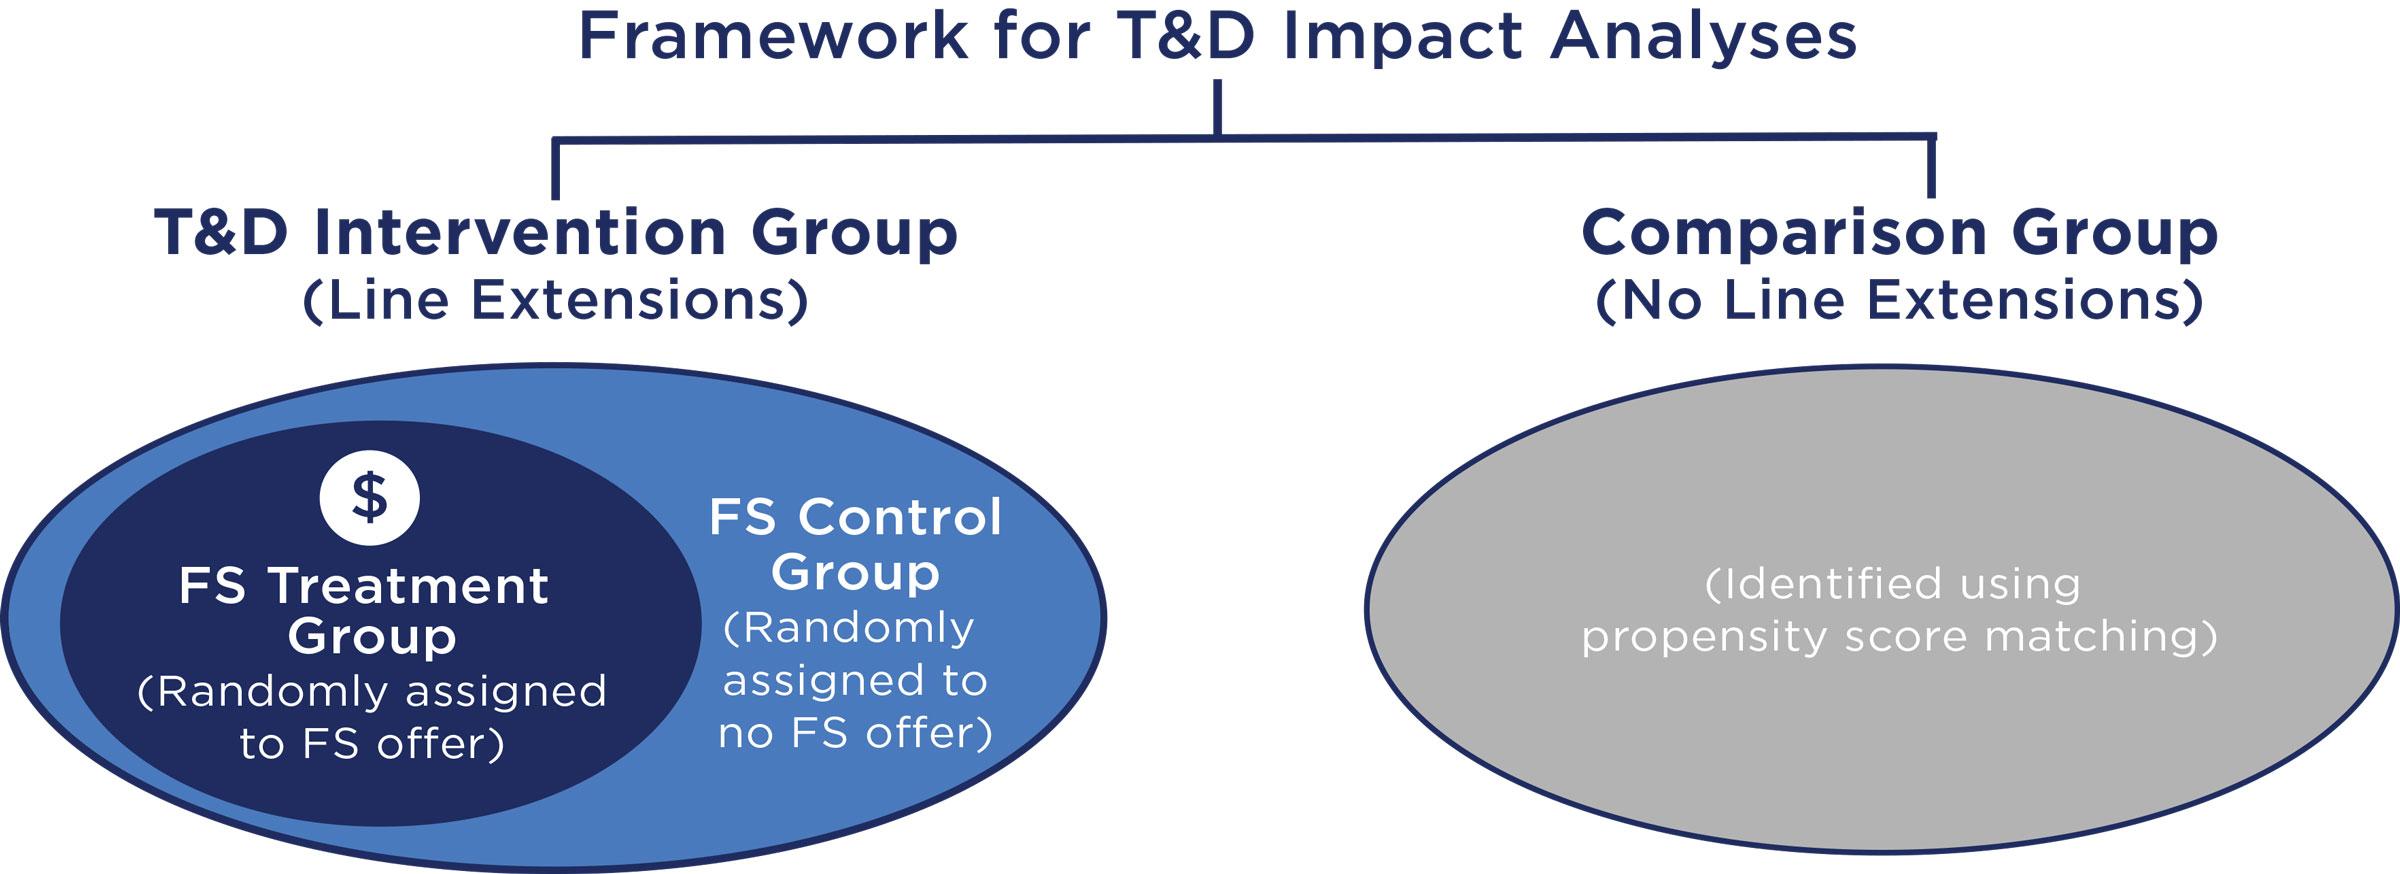 Framework for T&D Impact Analyses